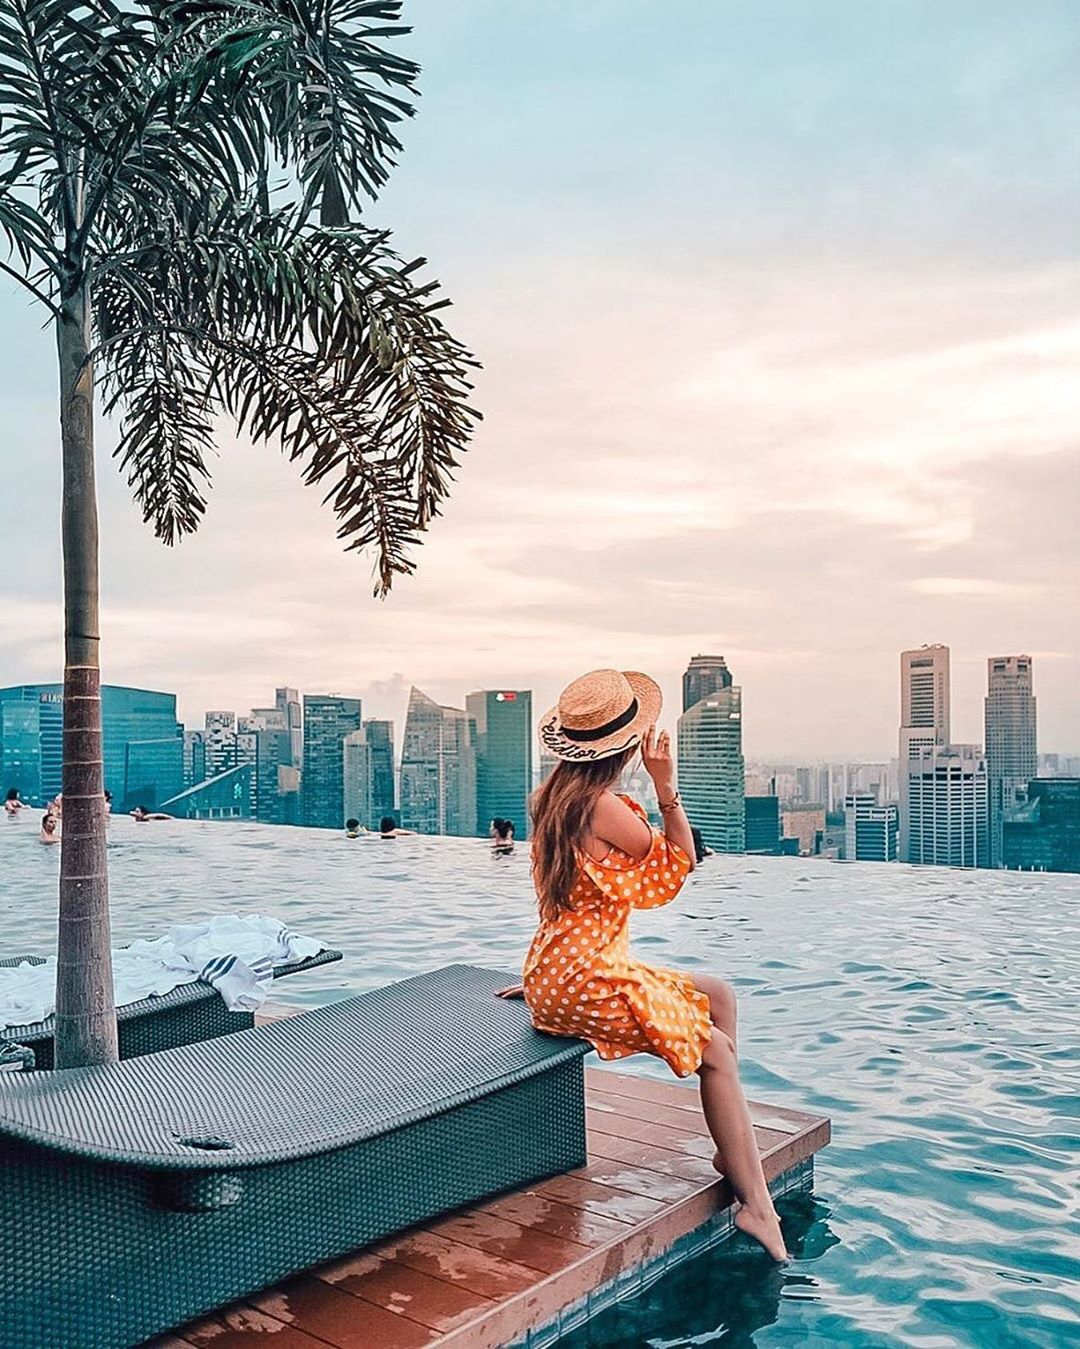 Marina Bay Sands - Singapore travel